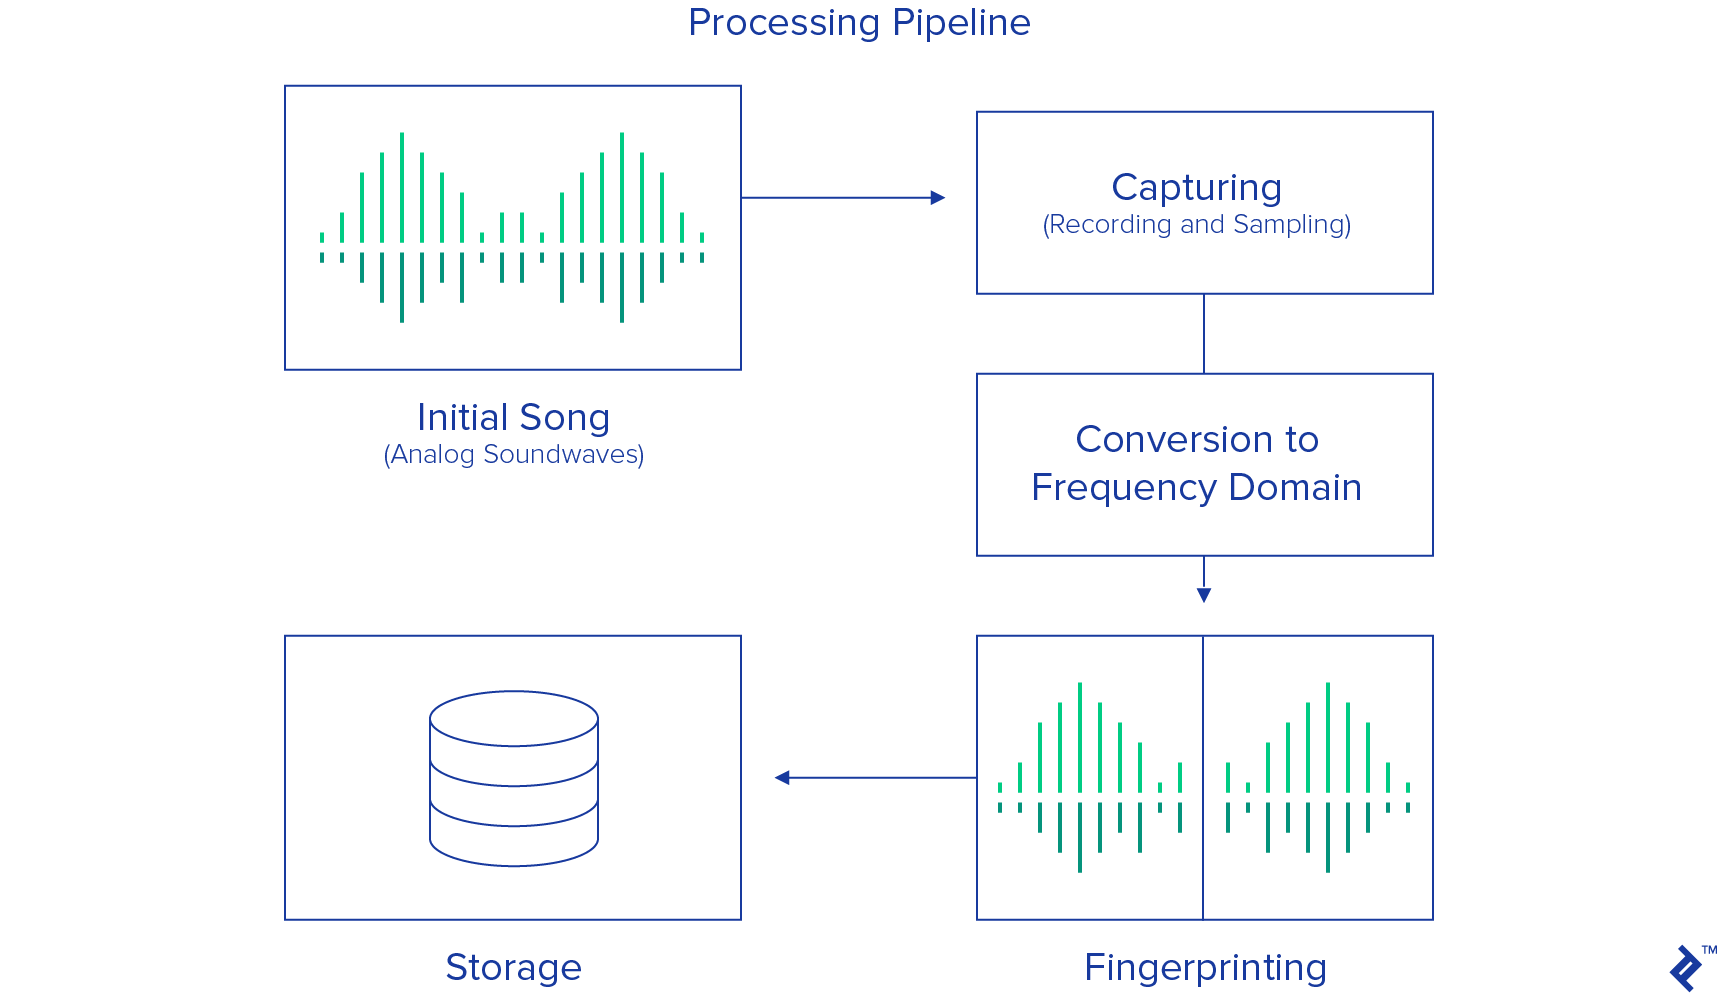 Processing Pipeline of Shazam